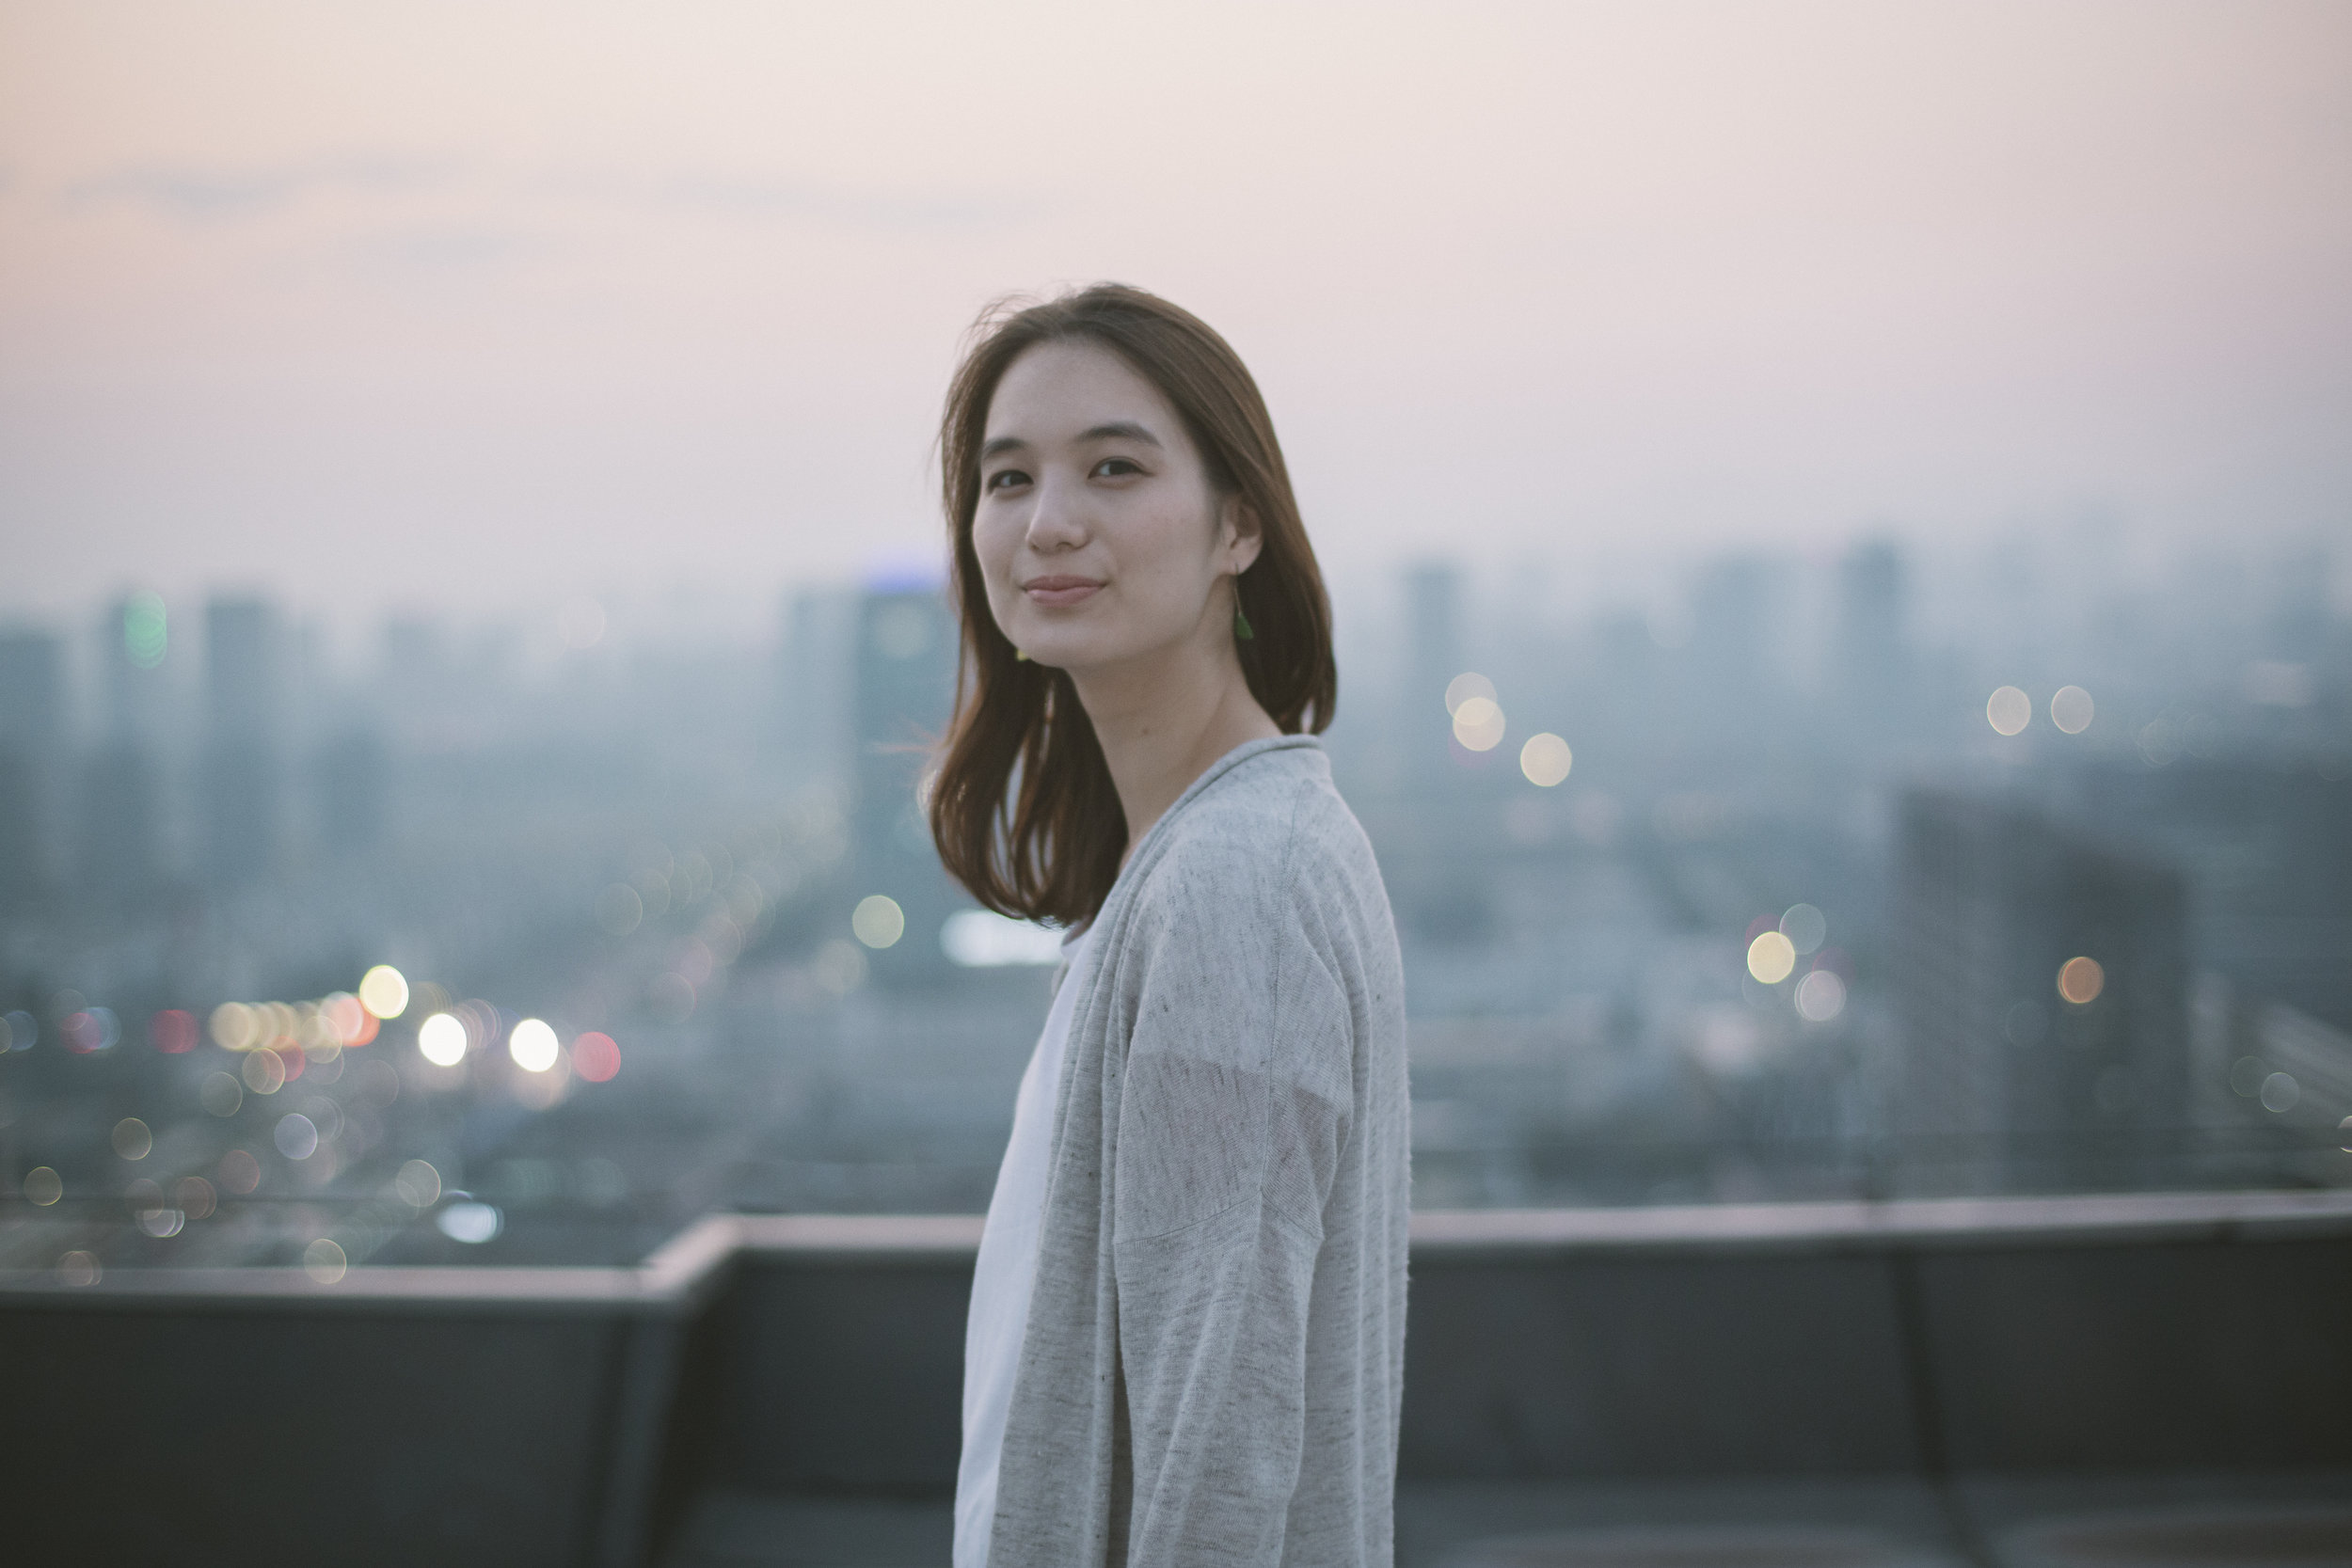 Photo by Kengo Kawatsura